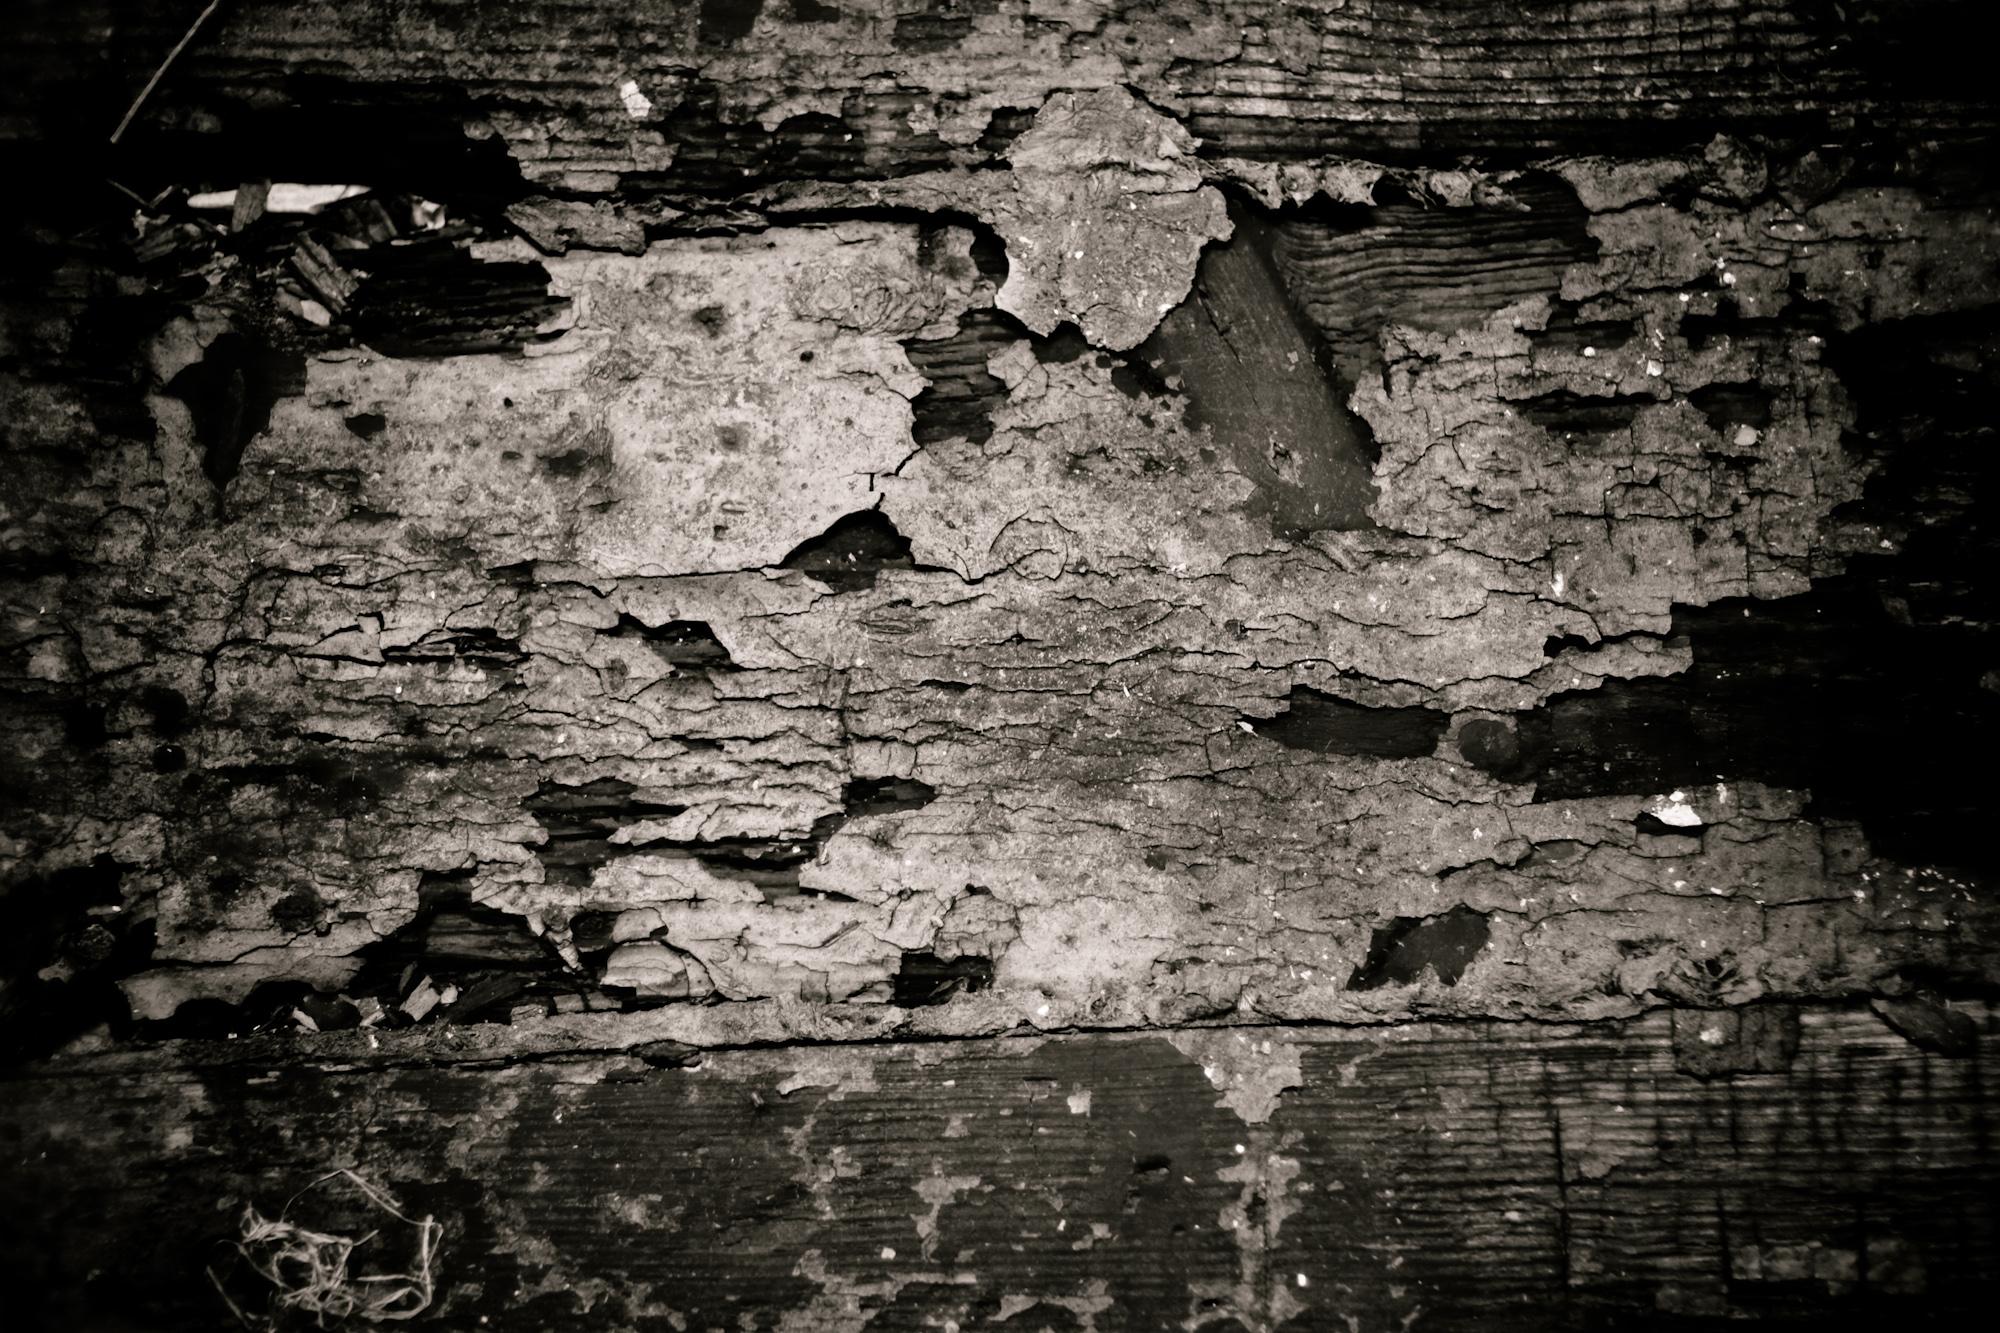 Grunge Cracked Paint, Cracked, Dark, Gloomy, Grunge, HQ Photo